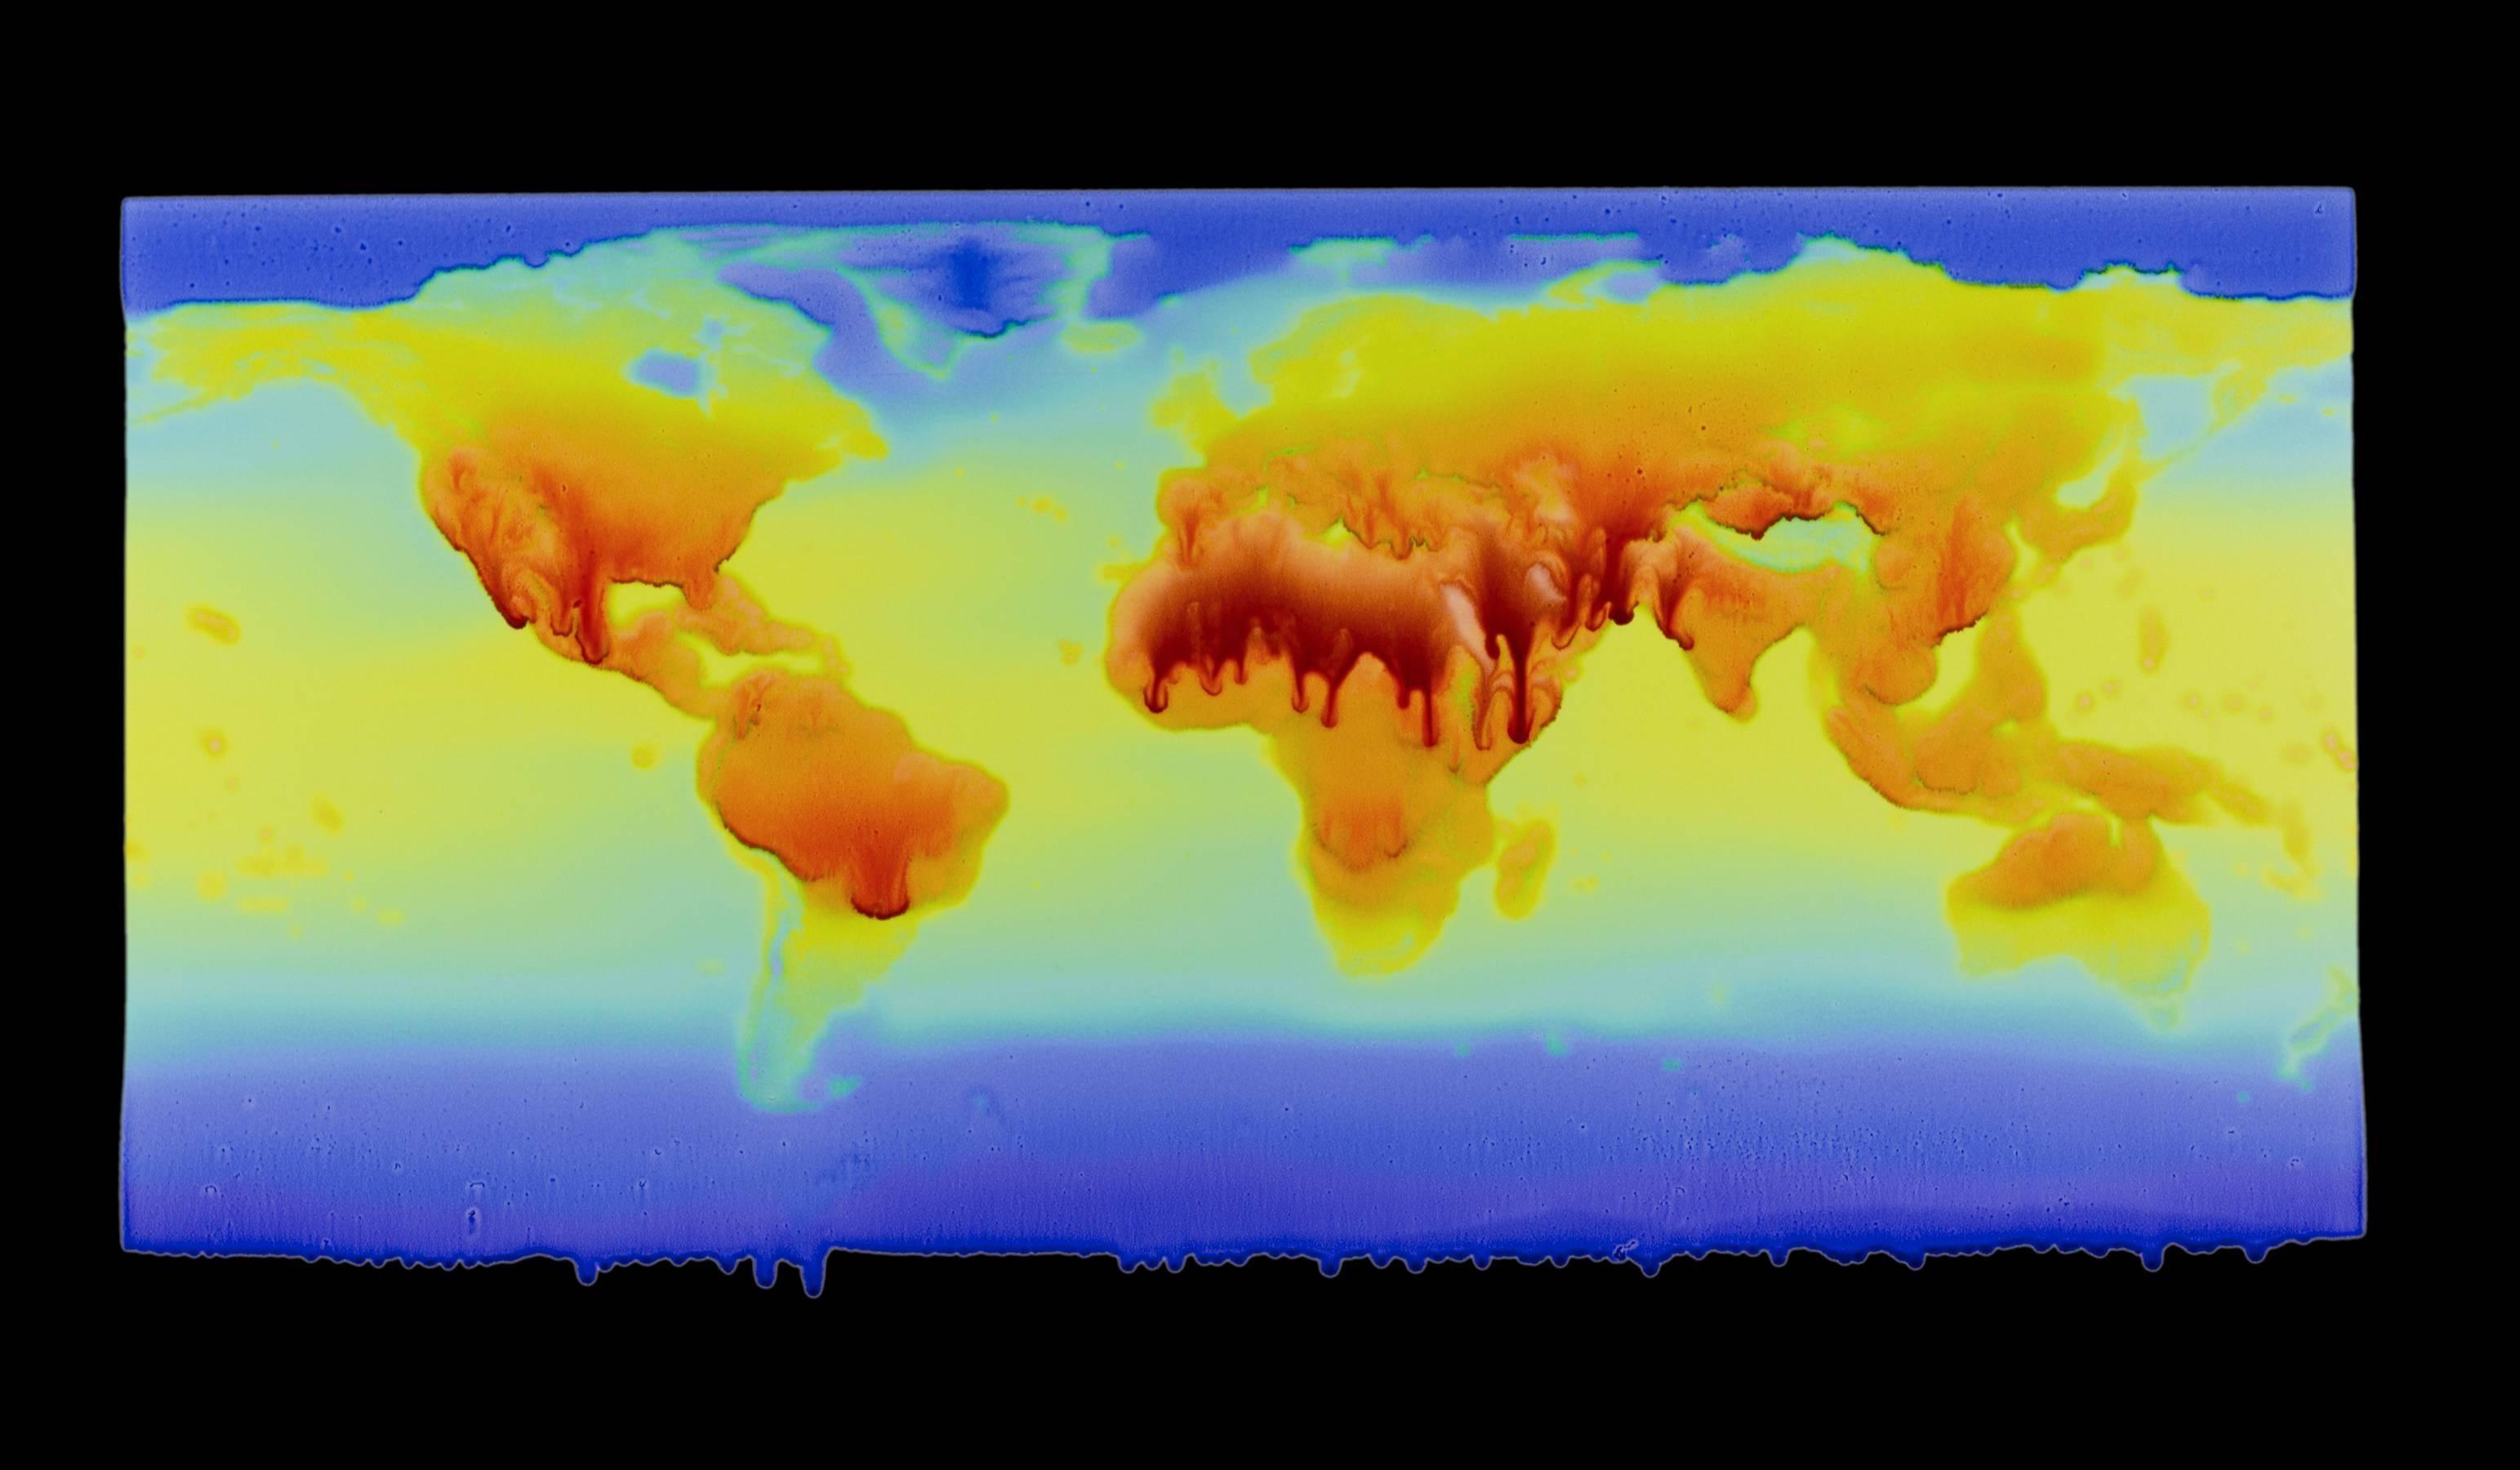 Jeff Becker, Planetary Breathing, 2017, Video, Digital Pigment Print